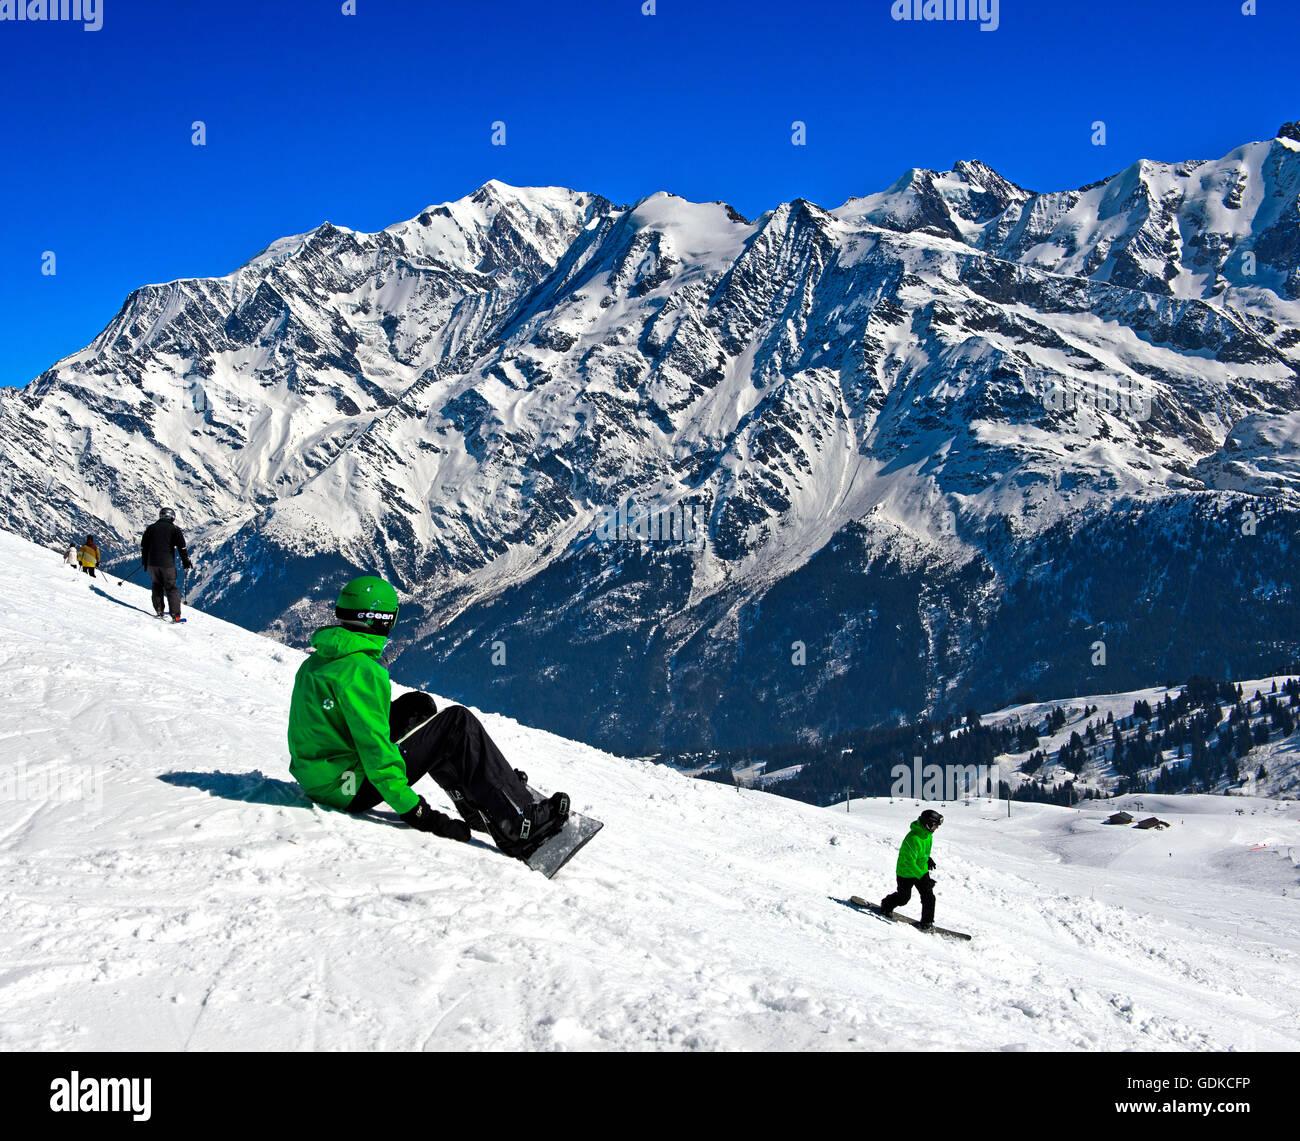 Snowboarder at Les Contamines-Montjoie ski resort, Haute-Savoie, France - Stock Image